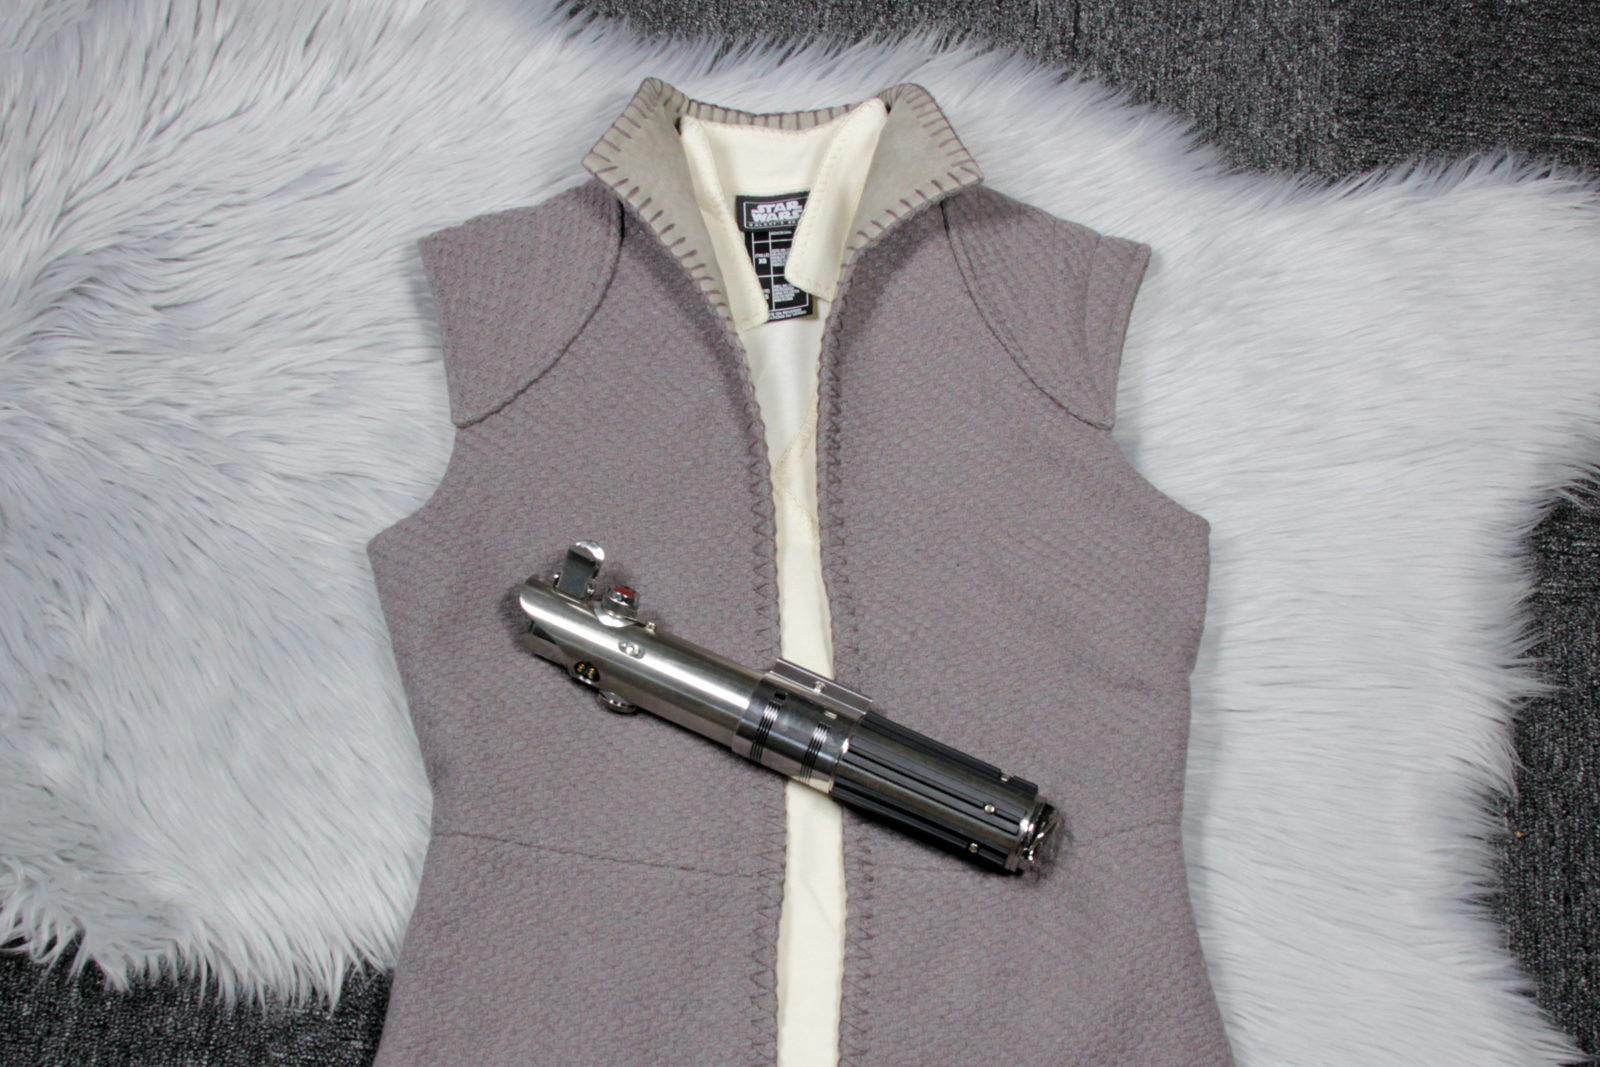 Mail Call – Galaxy's Edge Rey Vest & Shirt